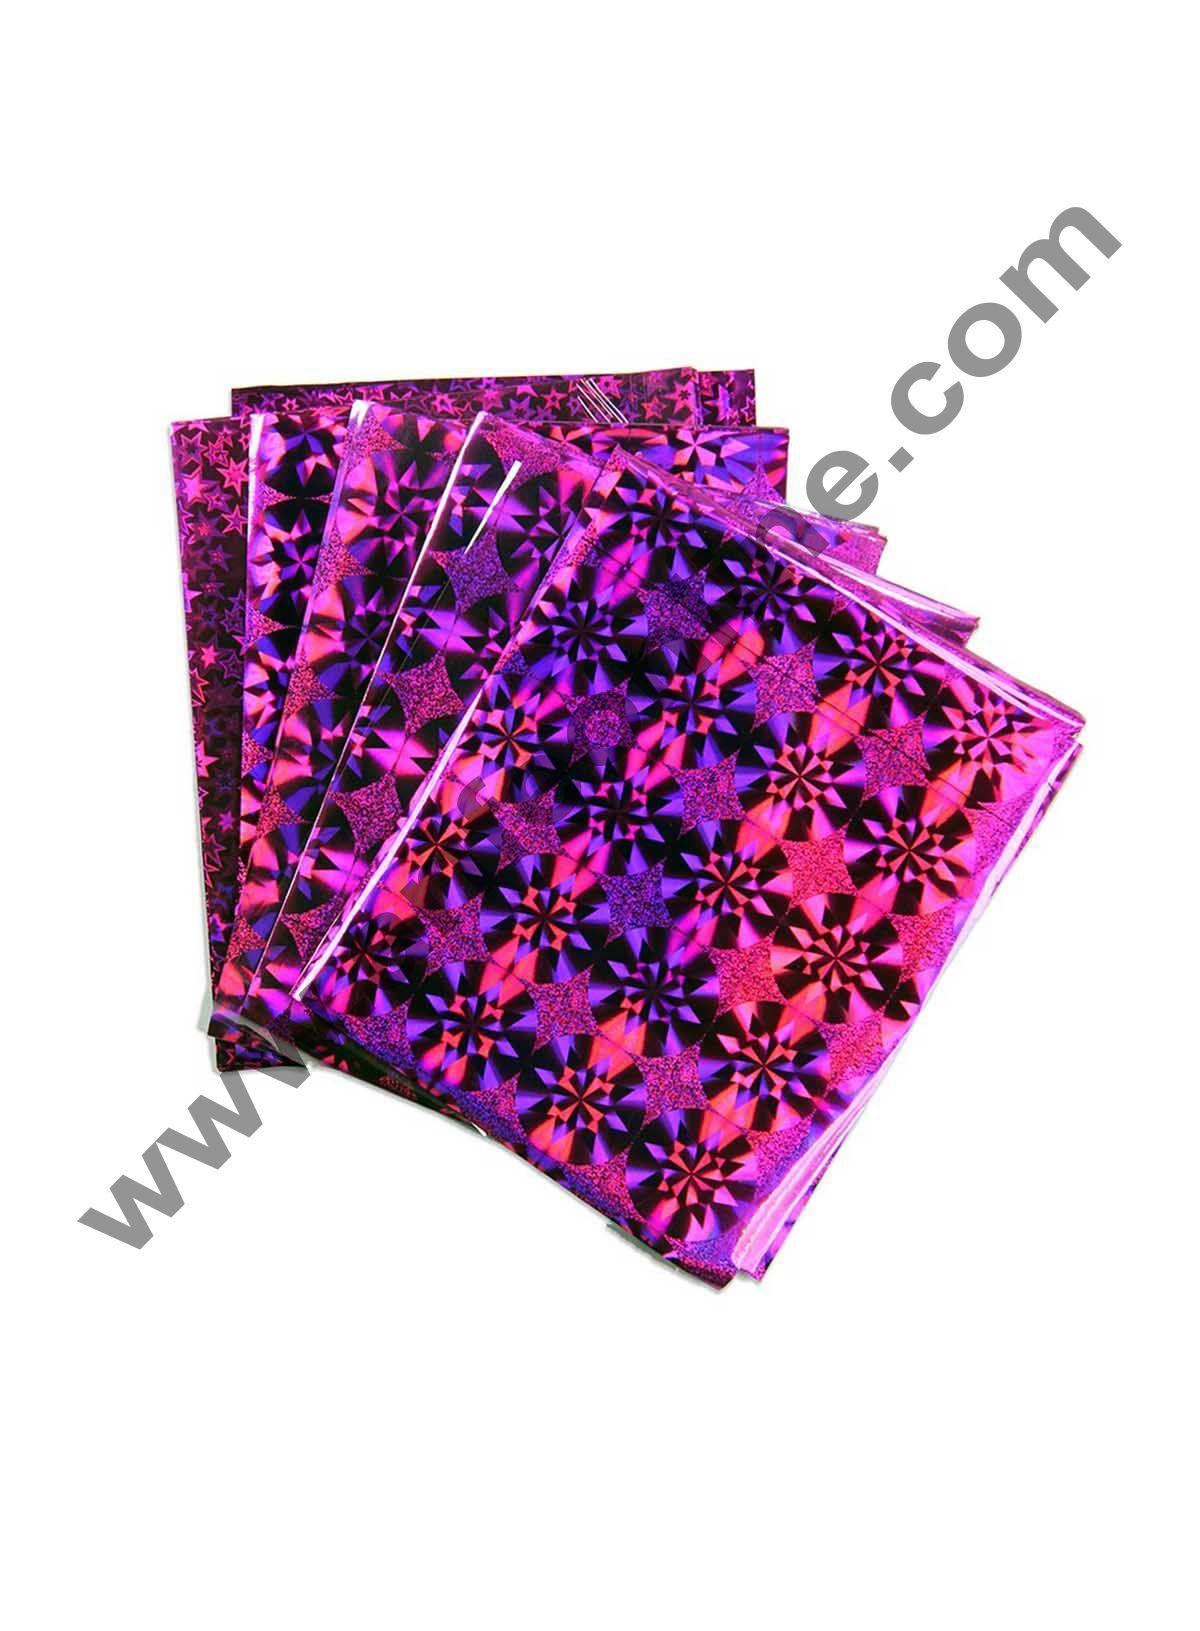 Cake Decor Metallic Hologram Plastic Chocolate Wrapper, Multicolour